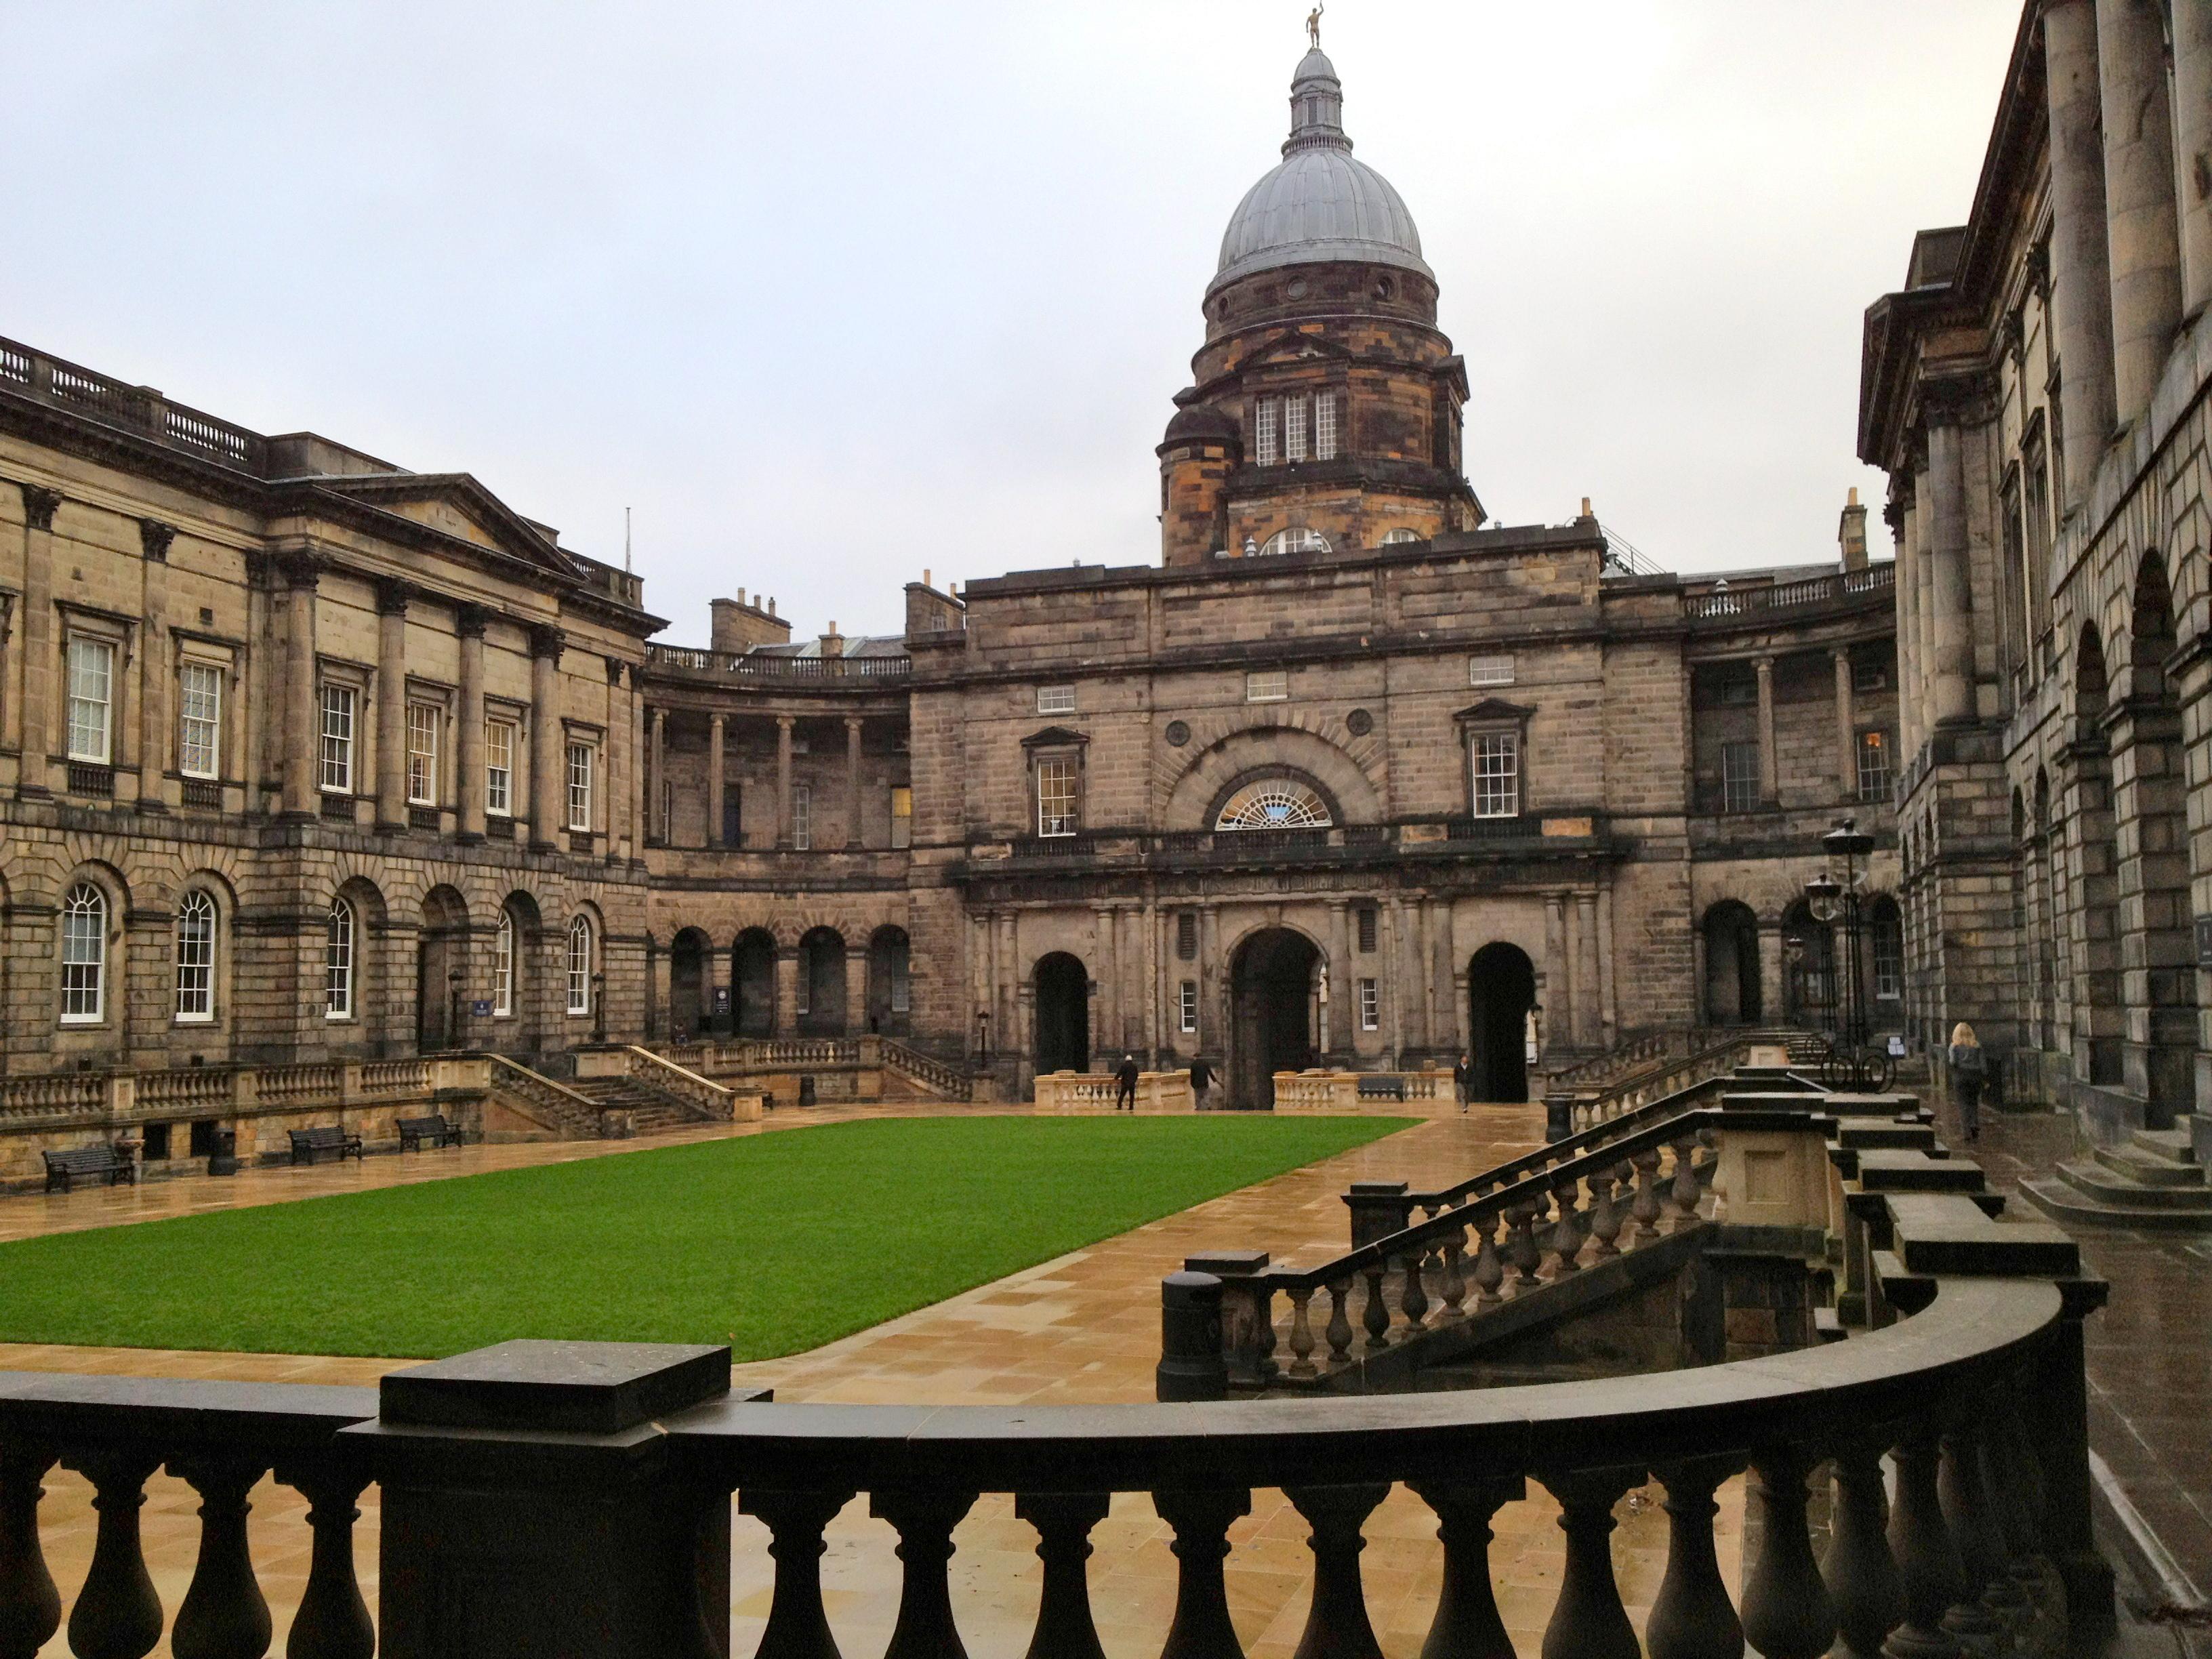 how good you know the top uk universities uii quiz playbuzz